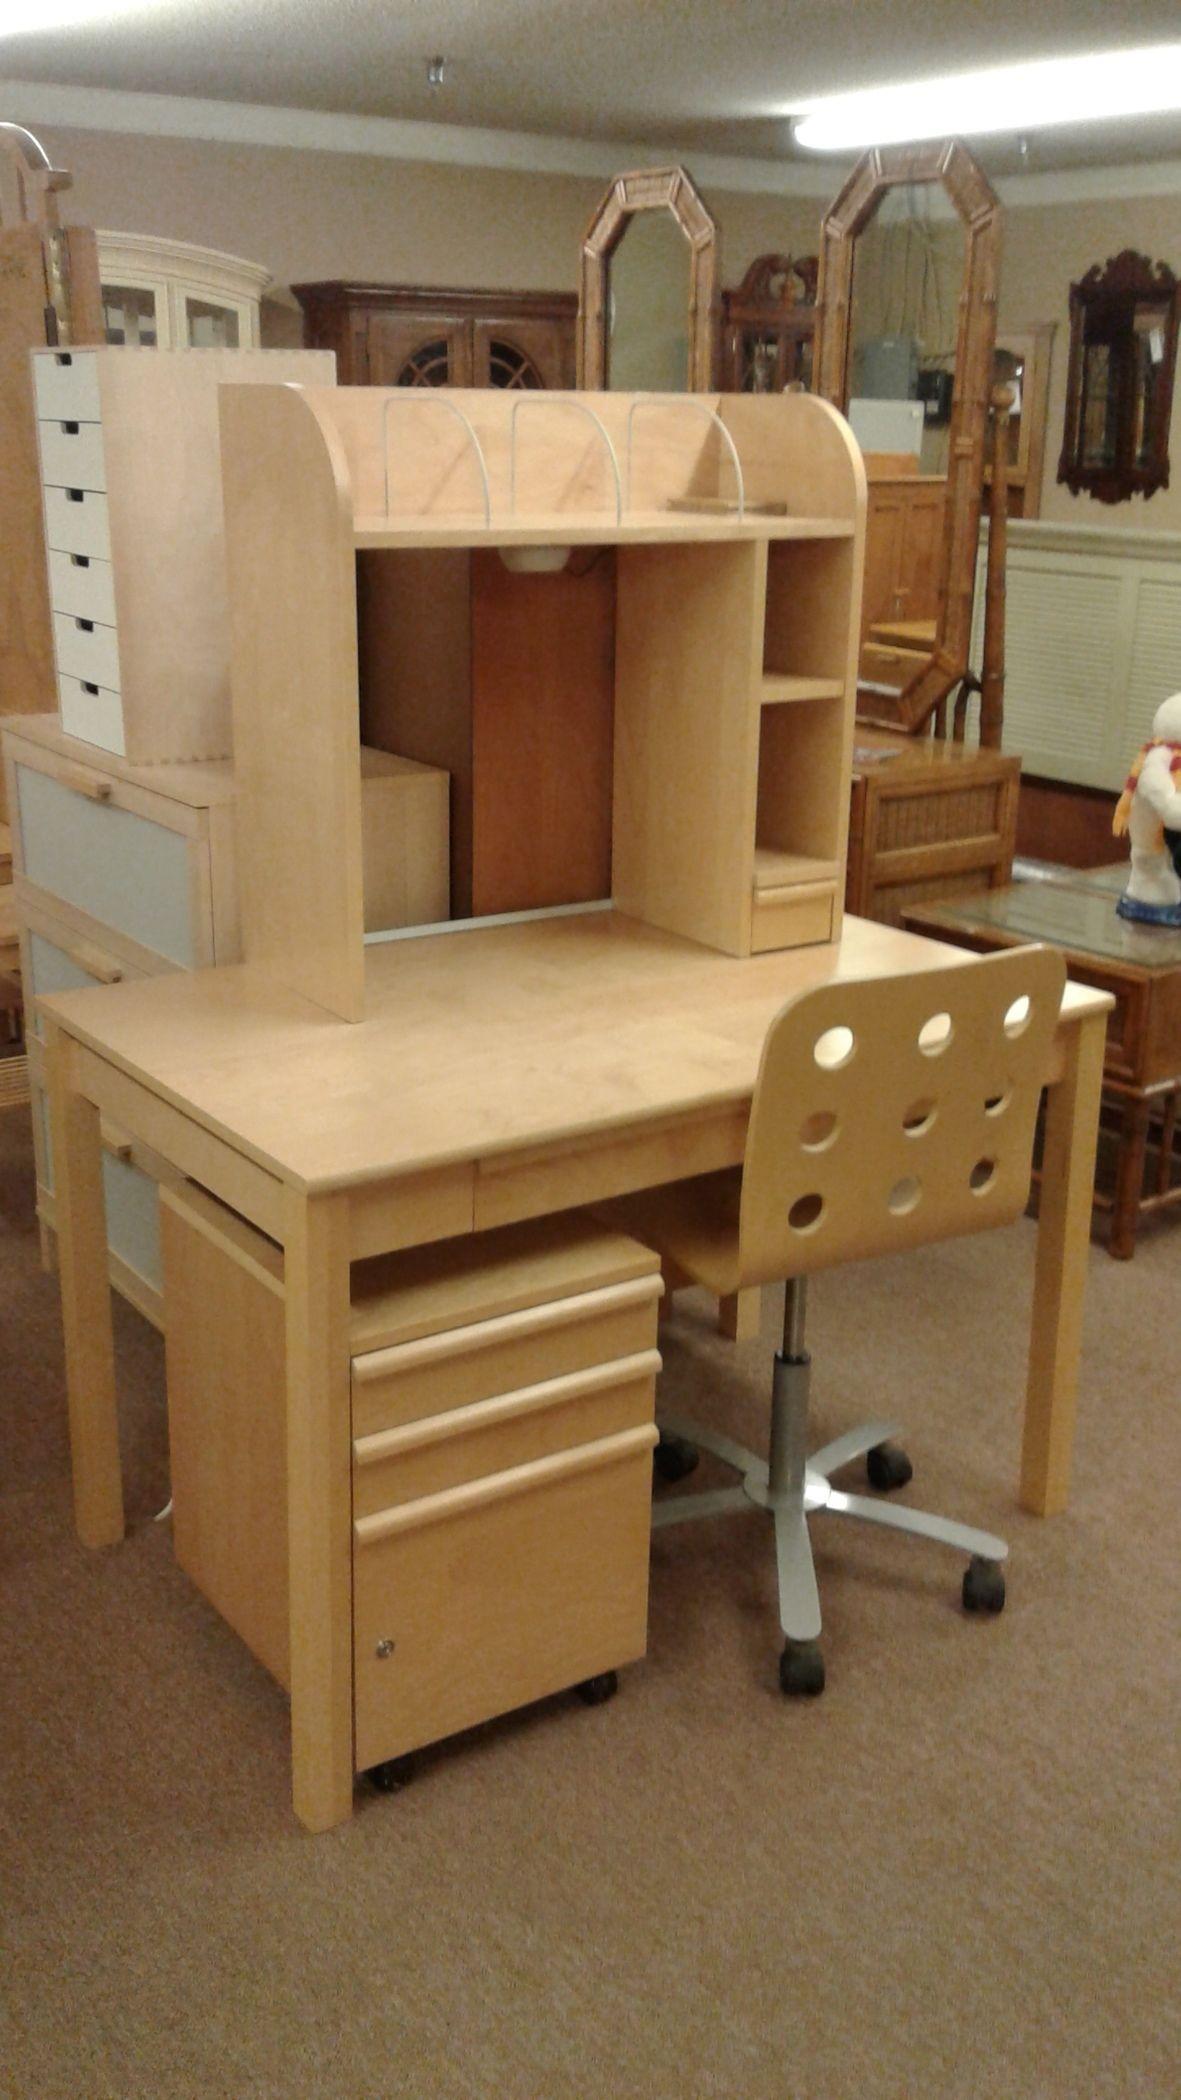 ikea desk plywood chair delmarva furniture consignment